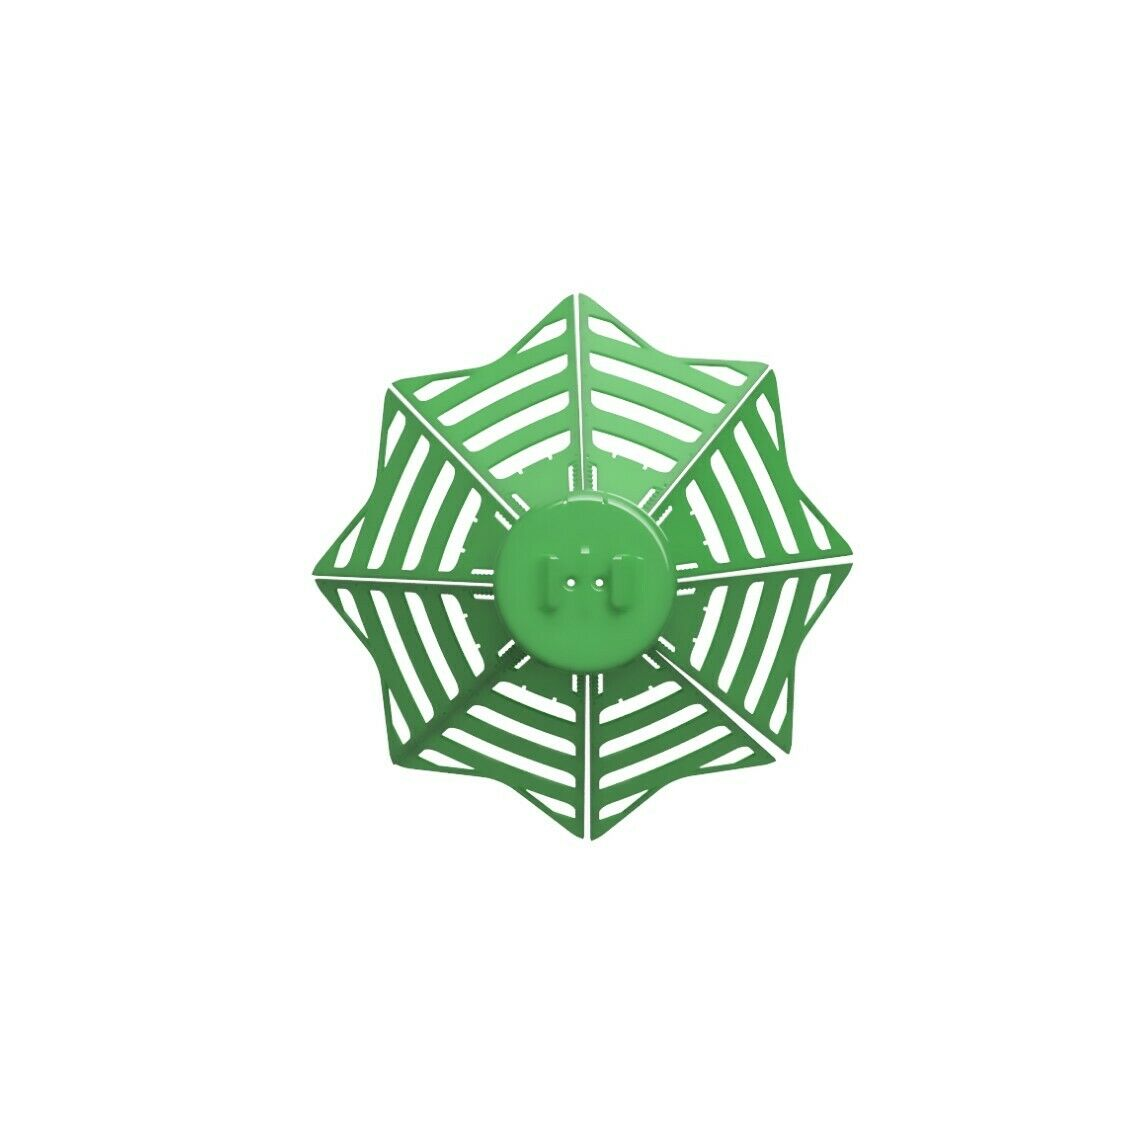 HCam Brush verde, Paragliding Chasecam, follow aeastaynamics cam, GoPro jHook